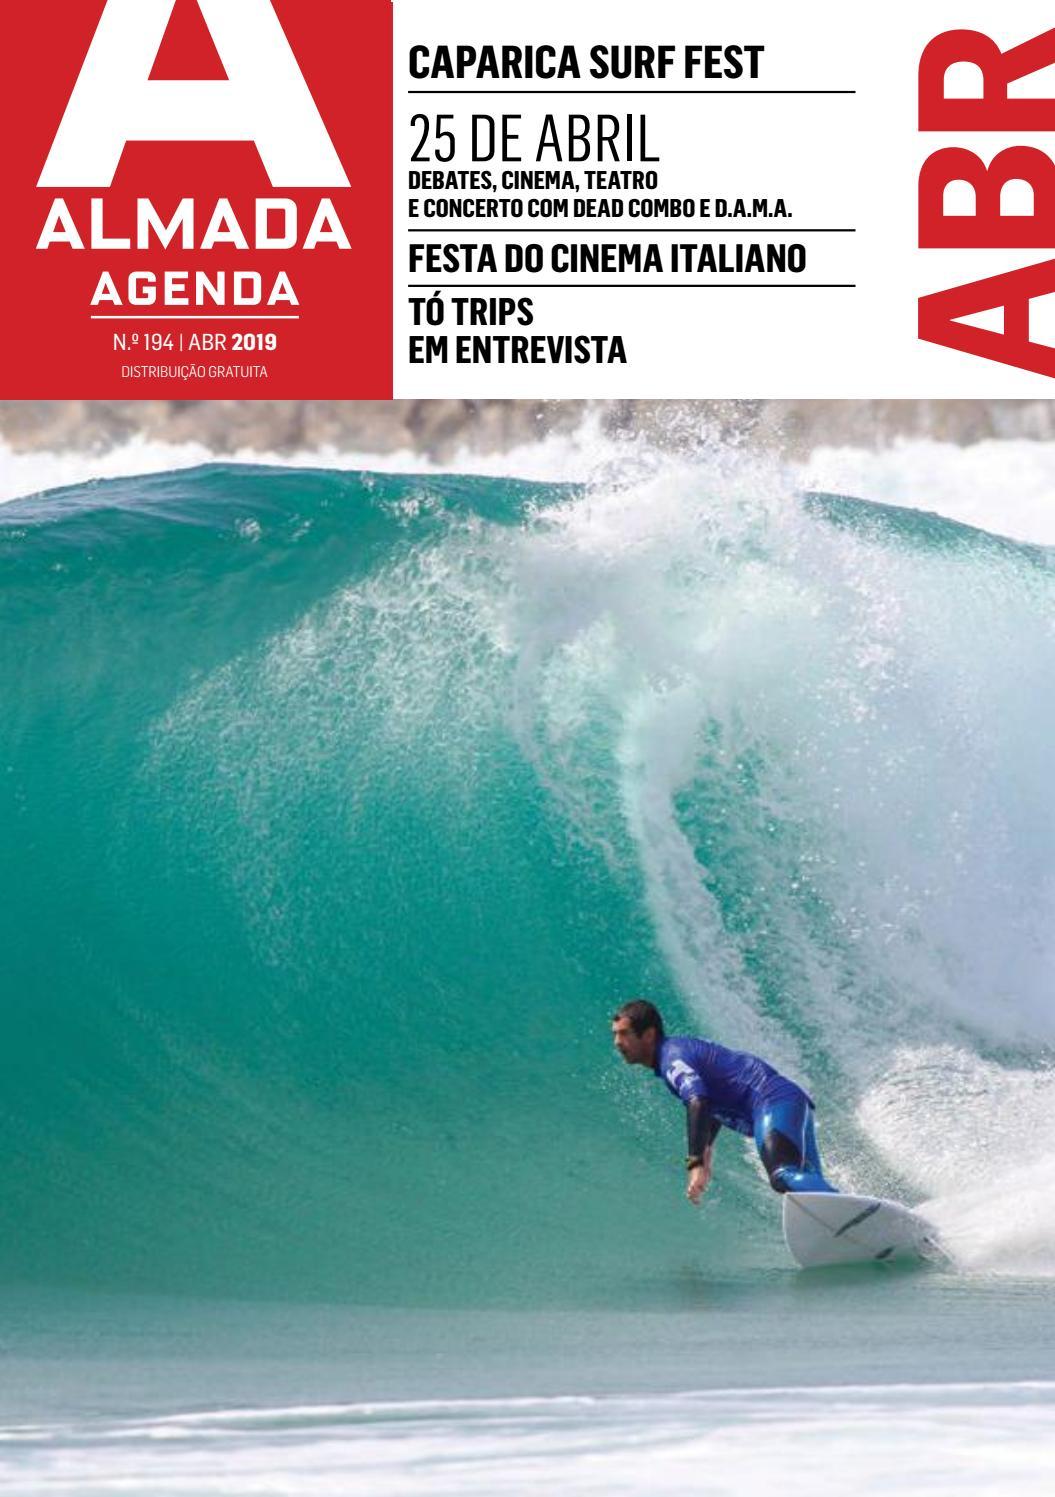 Agenda Almada N º 194 - abril 2019 by Câmara Municipal de